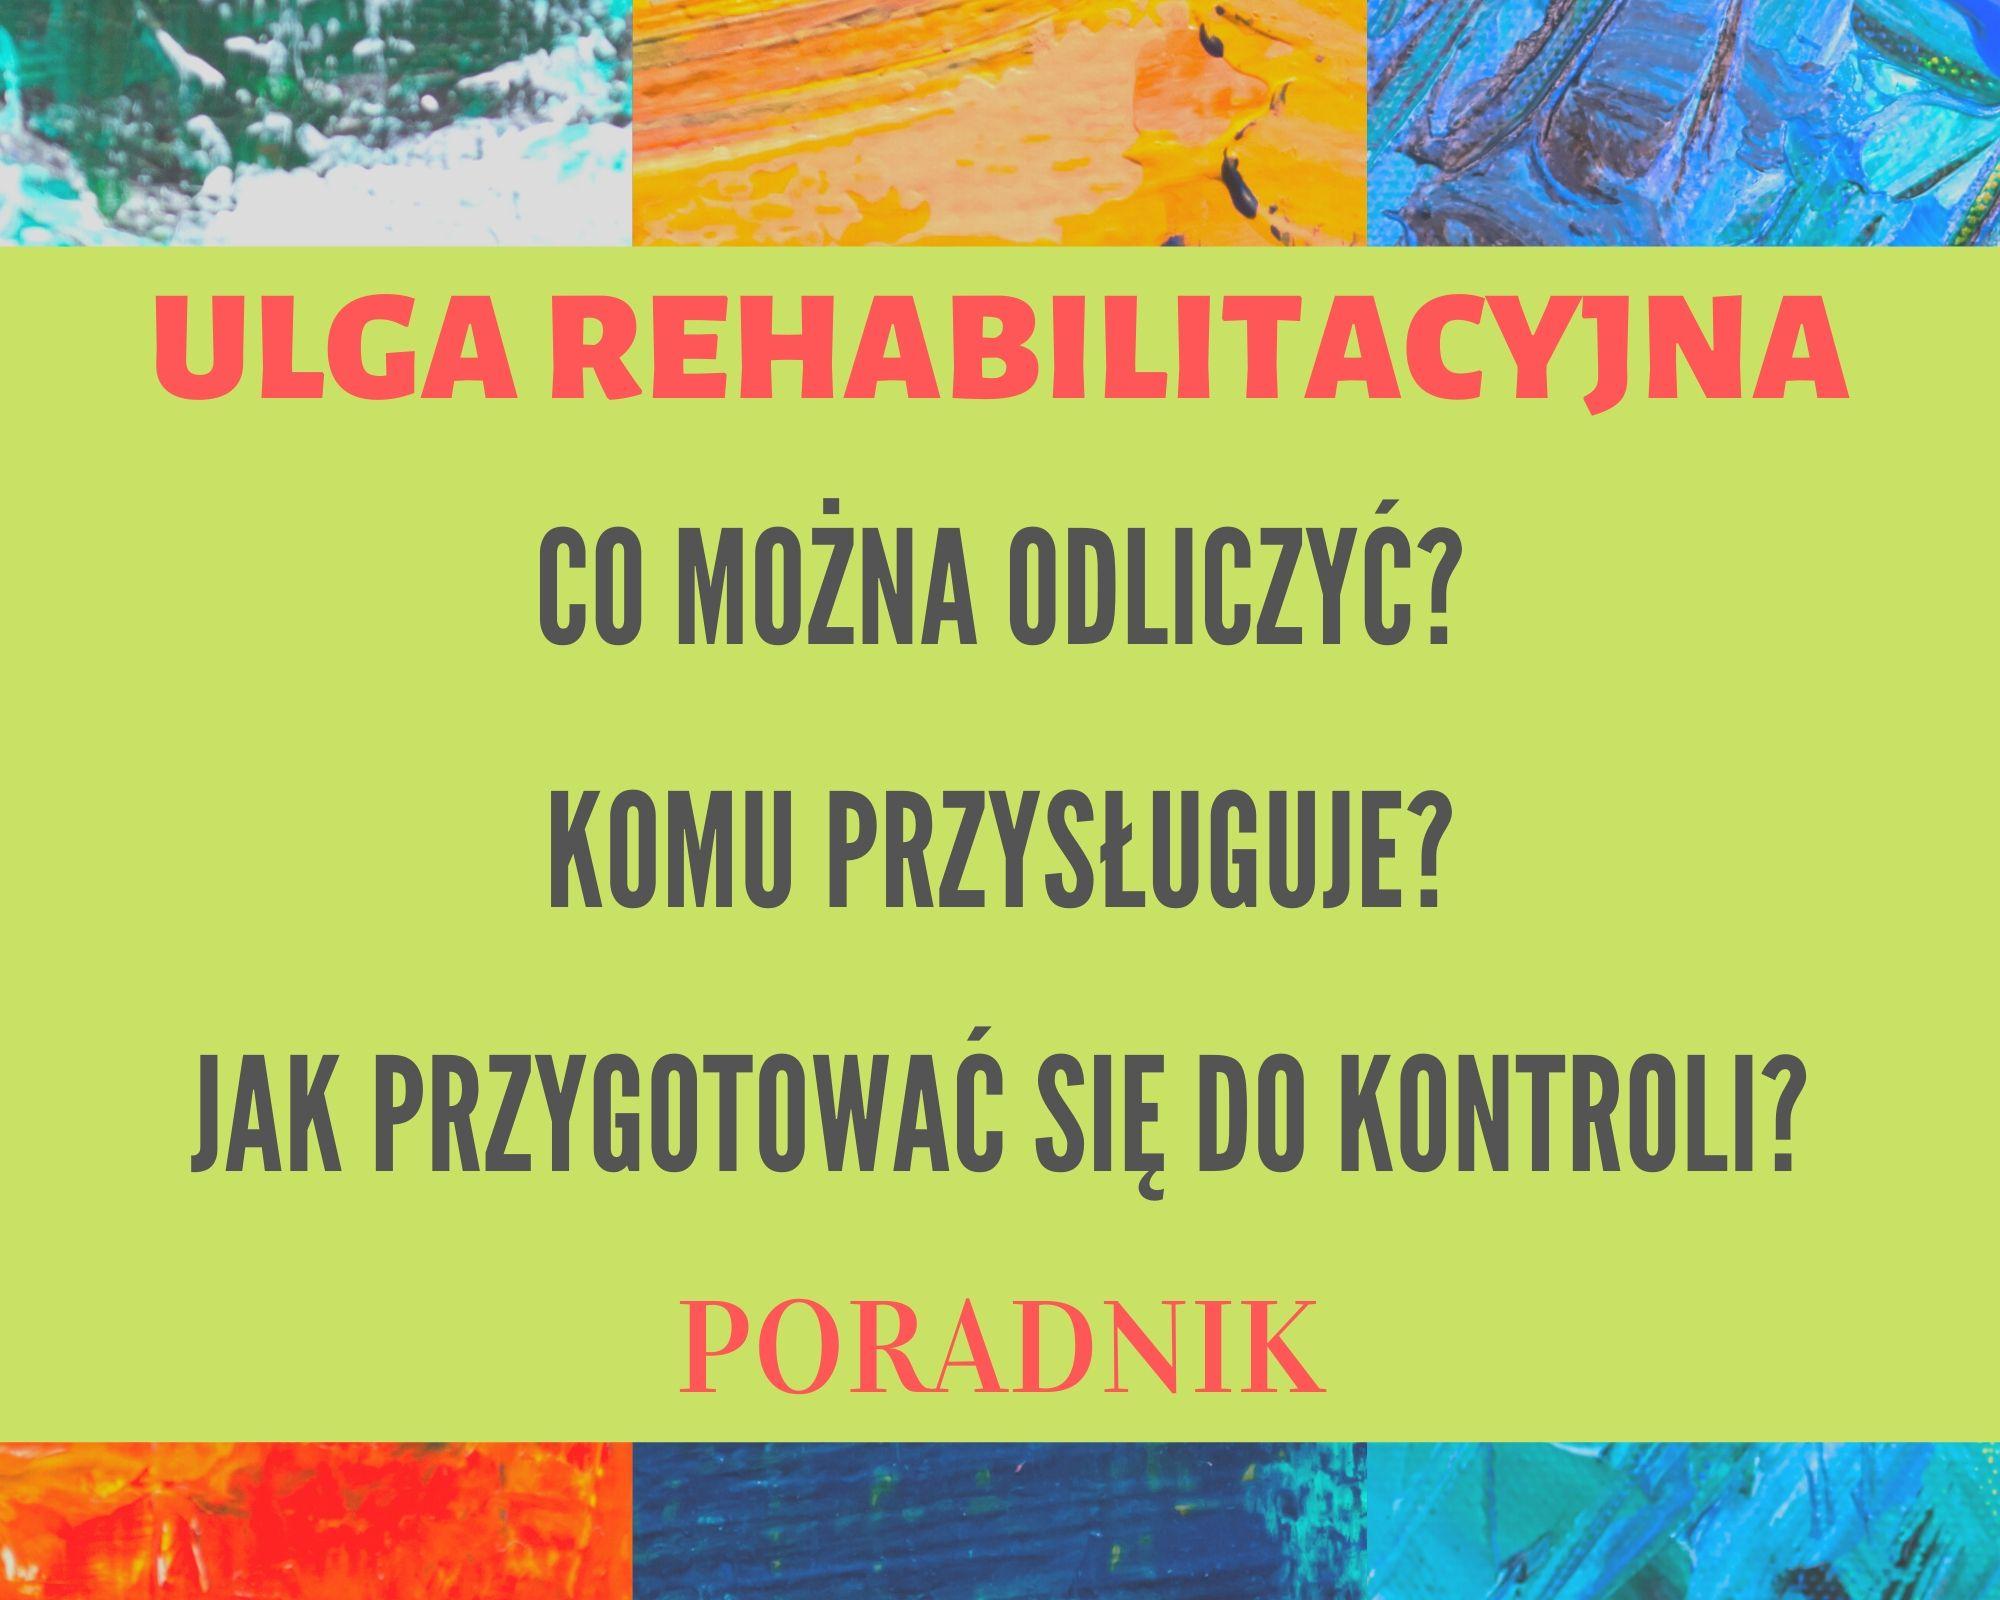 ulga-rehabilitacyjna